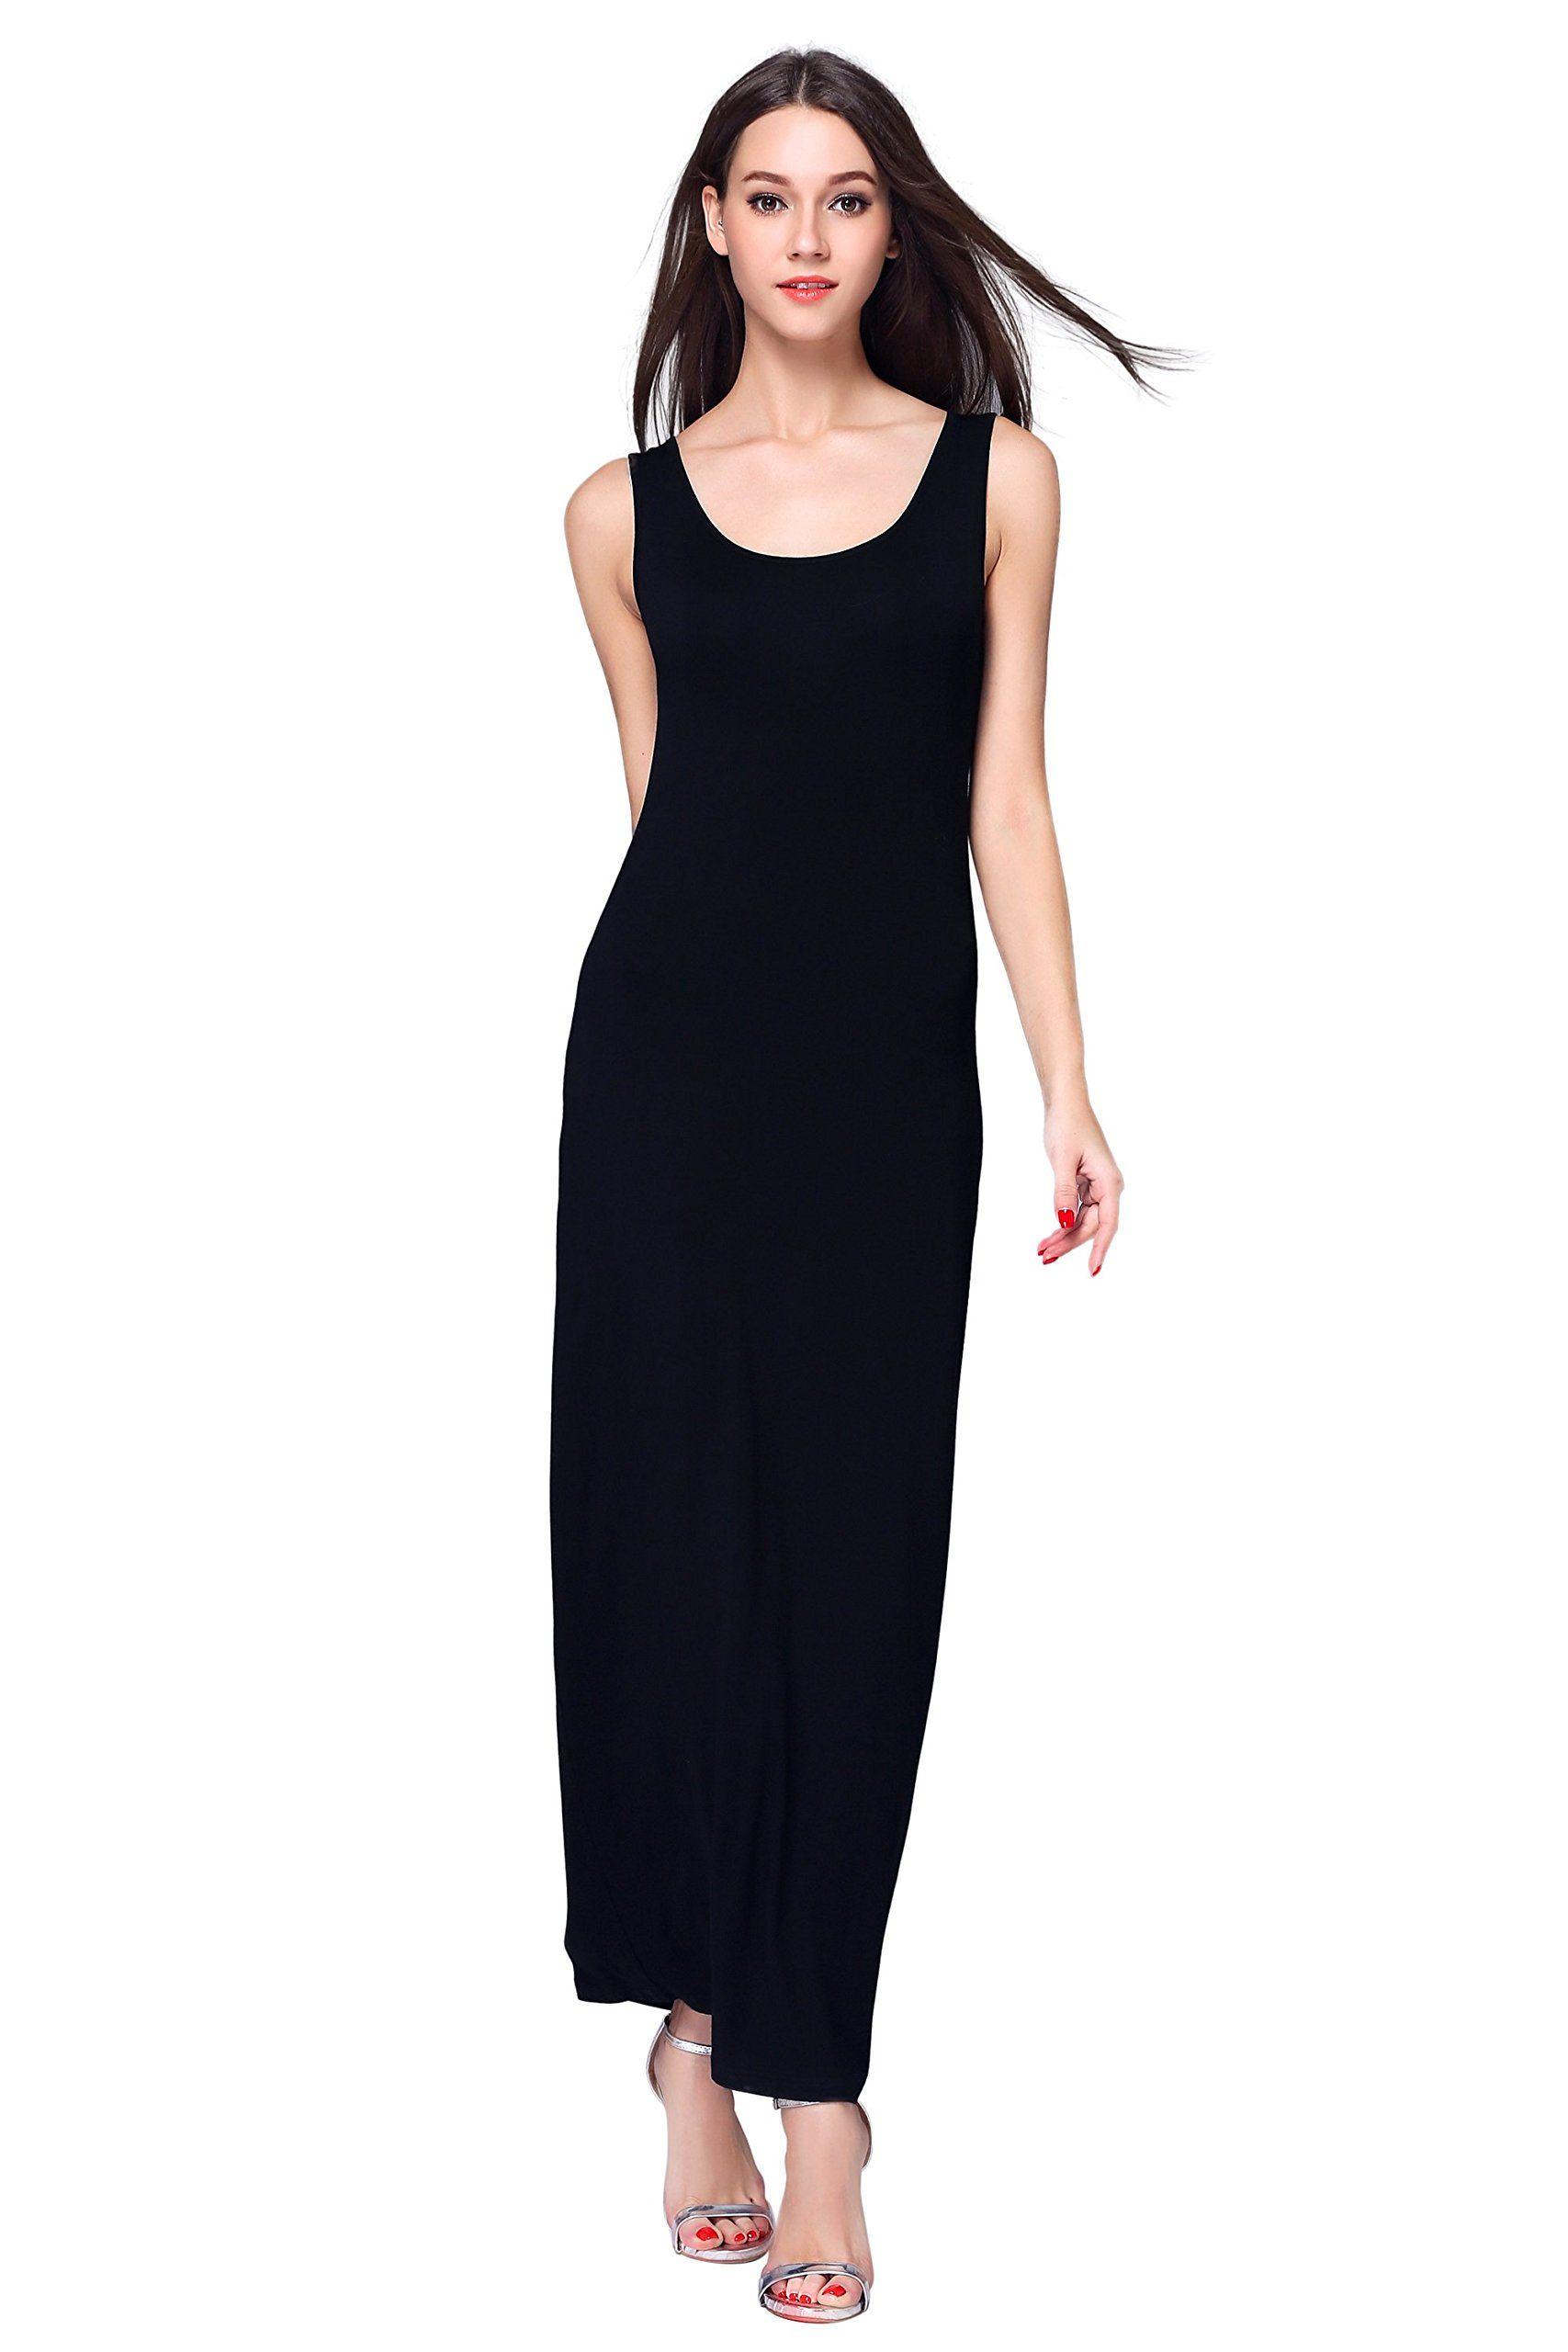 Hika Womens Fashion Sleeveless Casual Long Maxi Tank Dress Xlarge Black Want Additiona Long Black Maxi Dress Women Dress Collection Sleeveless Dresses Casual [ 2560 x 1707 Pixel ]